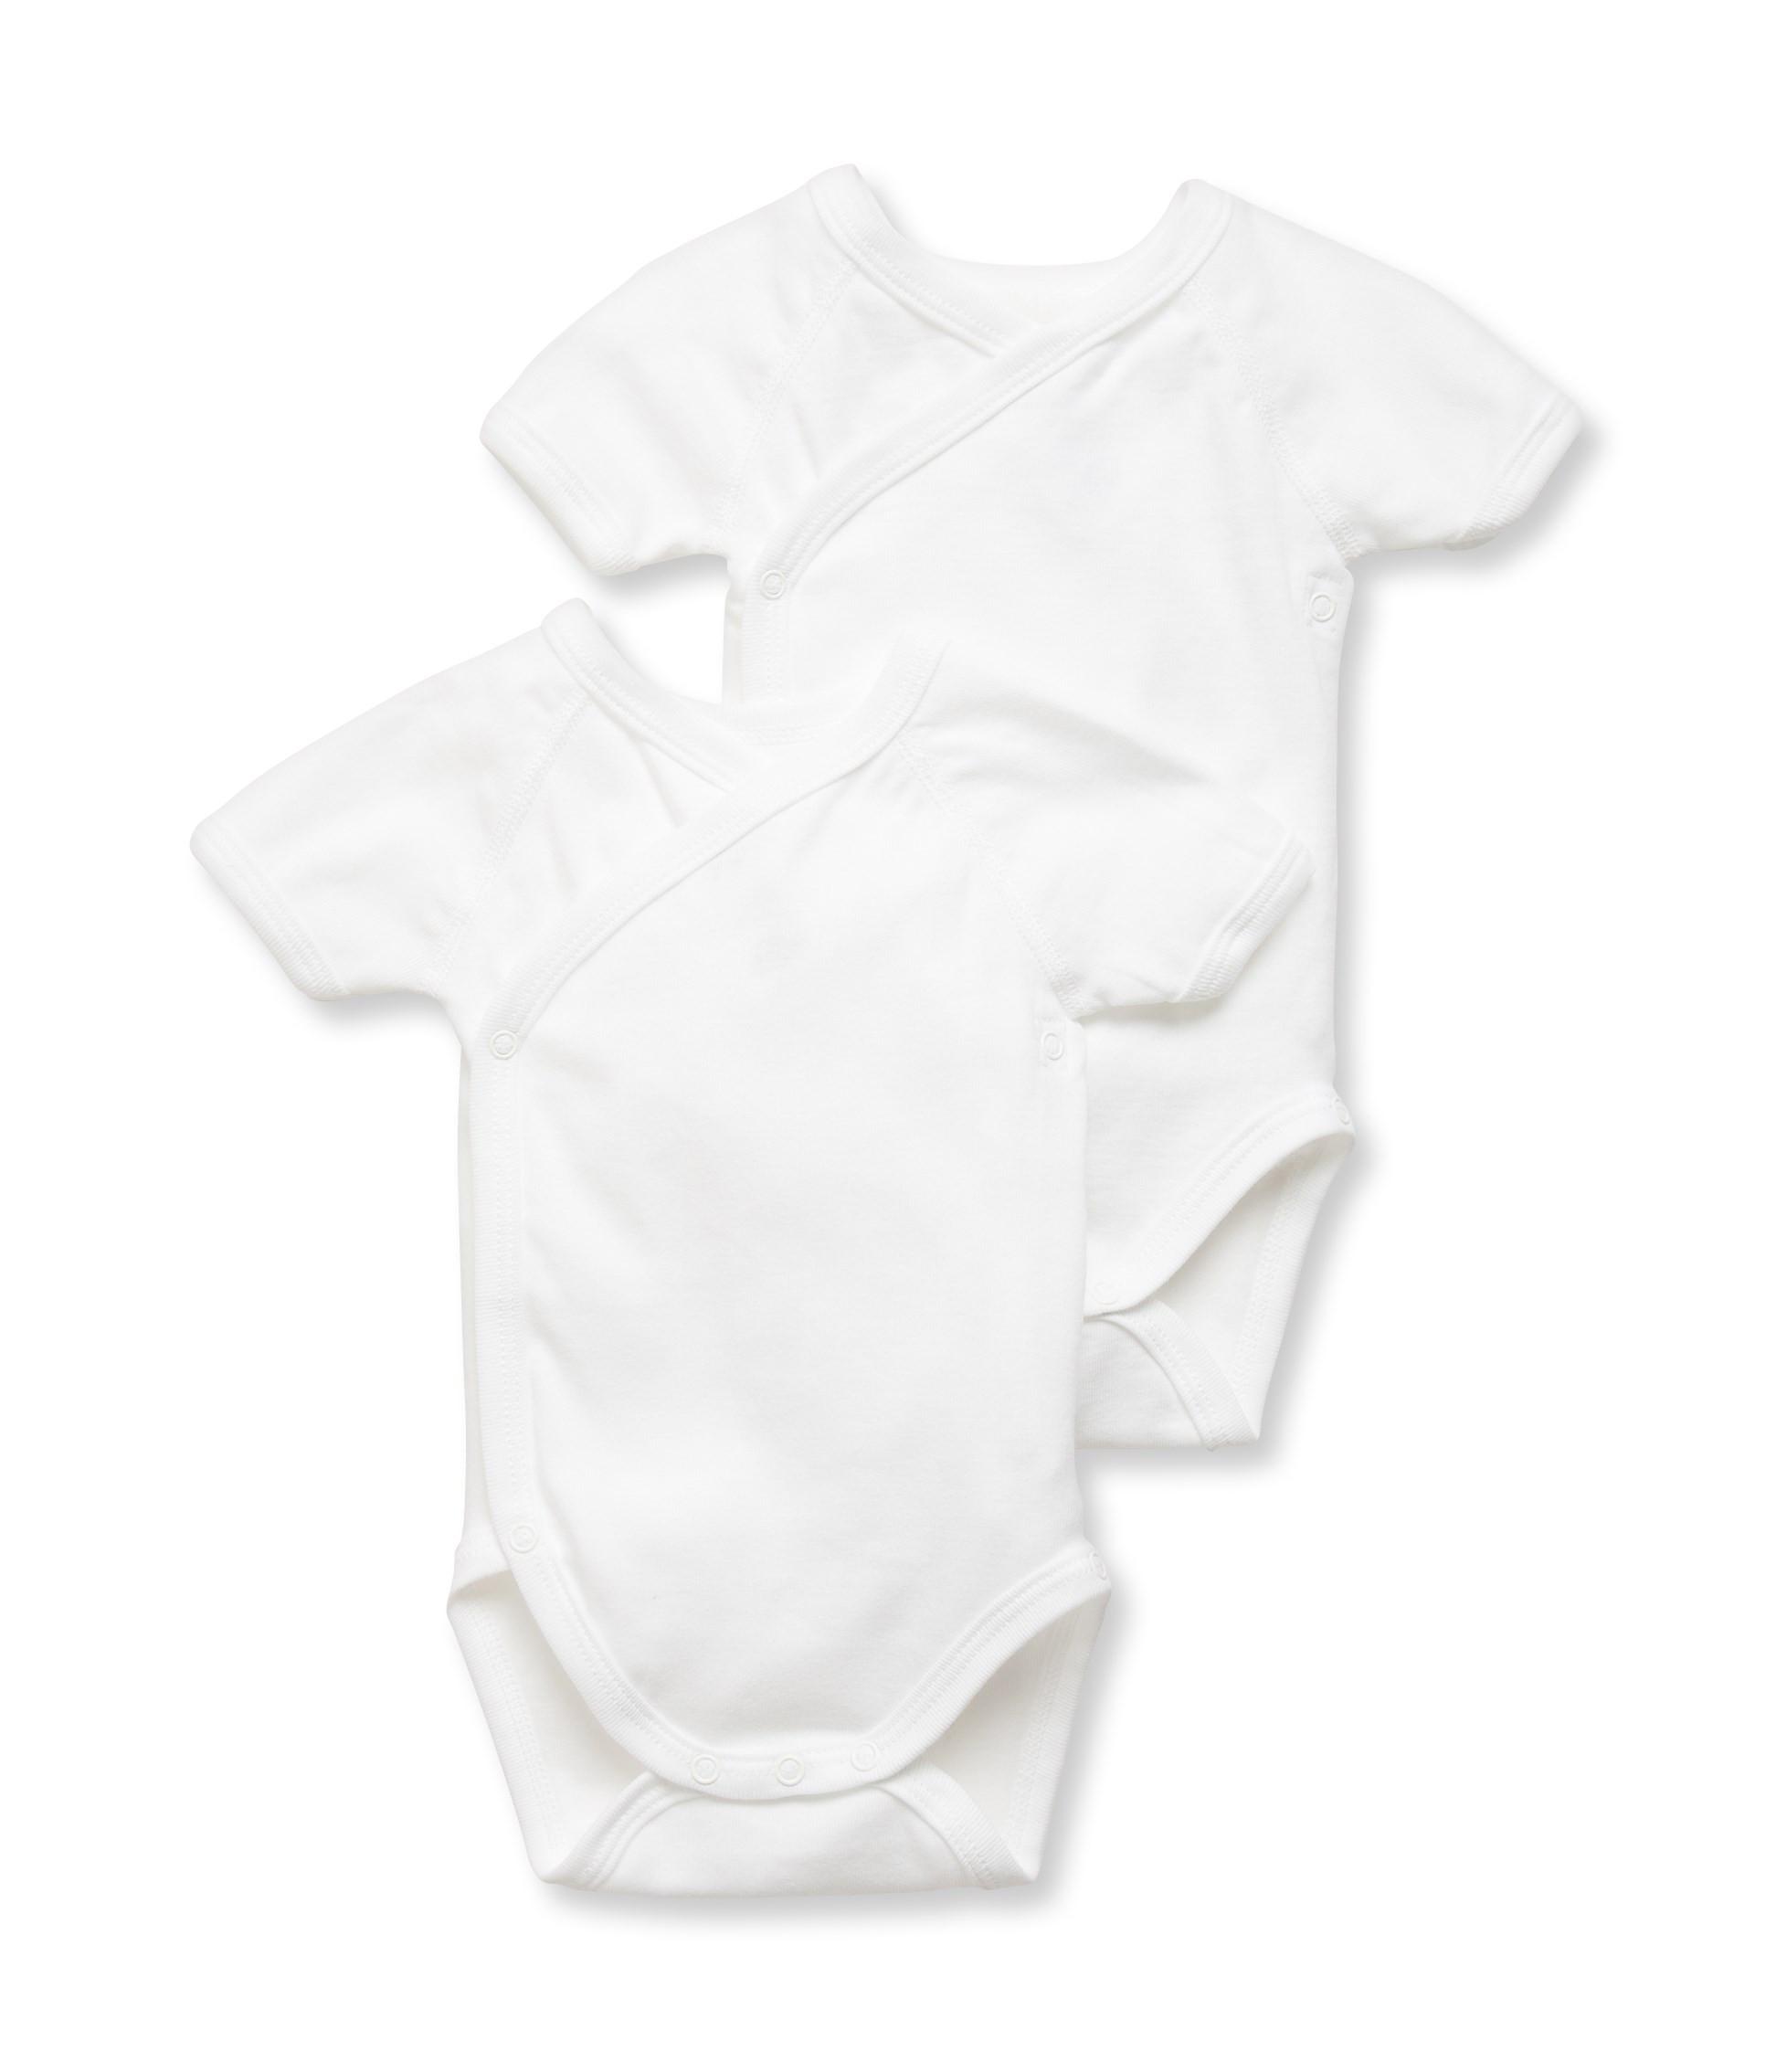 body nascita unisex maniche corte con 2pezzi art 15092 petit bateau colore bianco. Black Bedroom Furniture Sets. Home Design Ideas